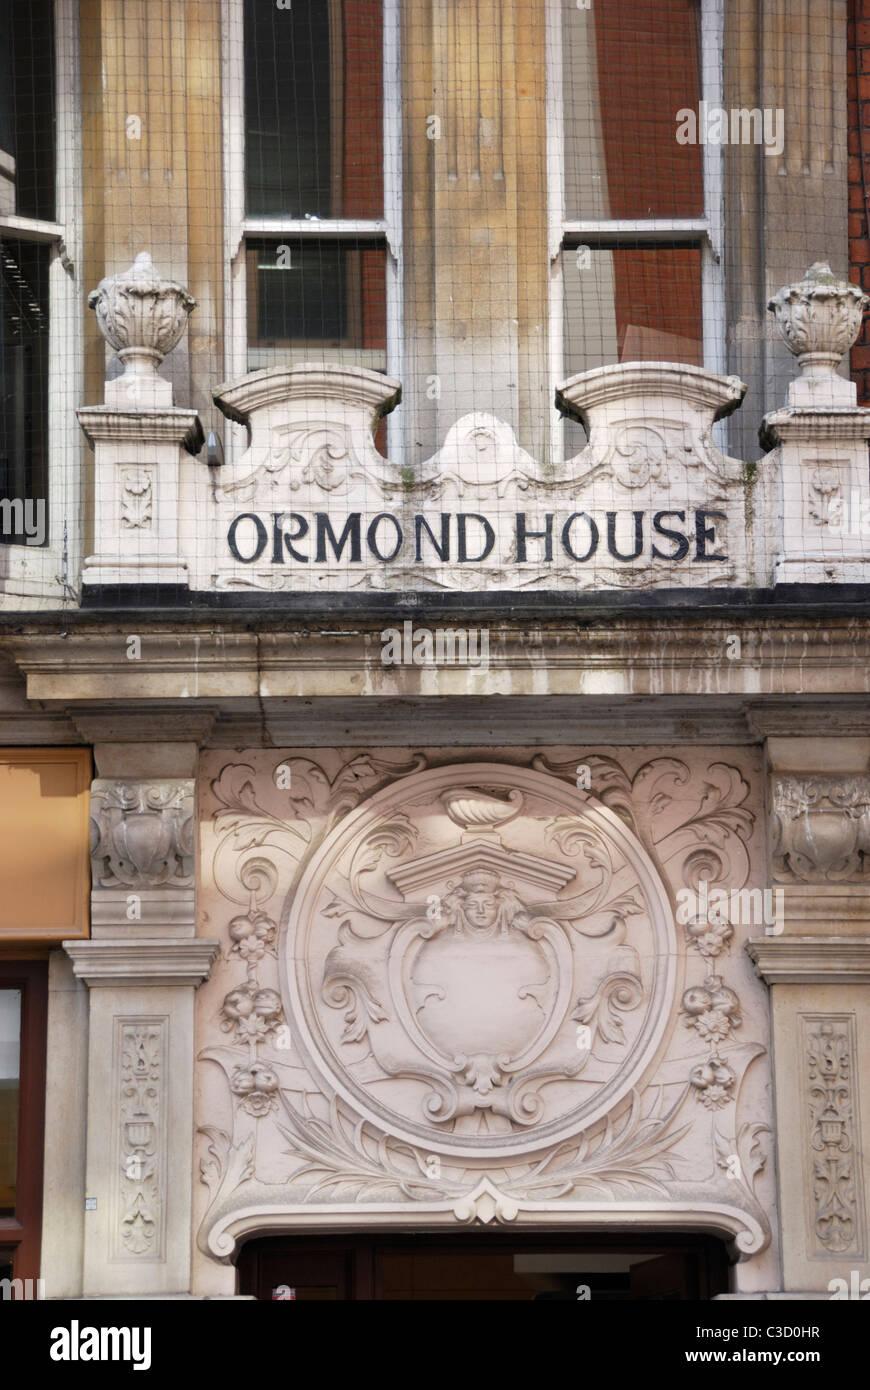 Ormond House, Duke of York St, St James's, London, England - Stock Image